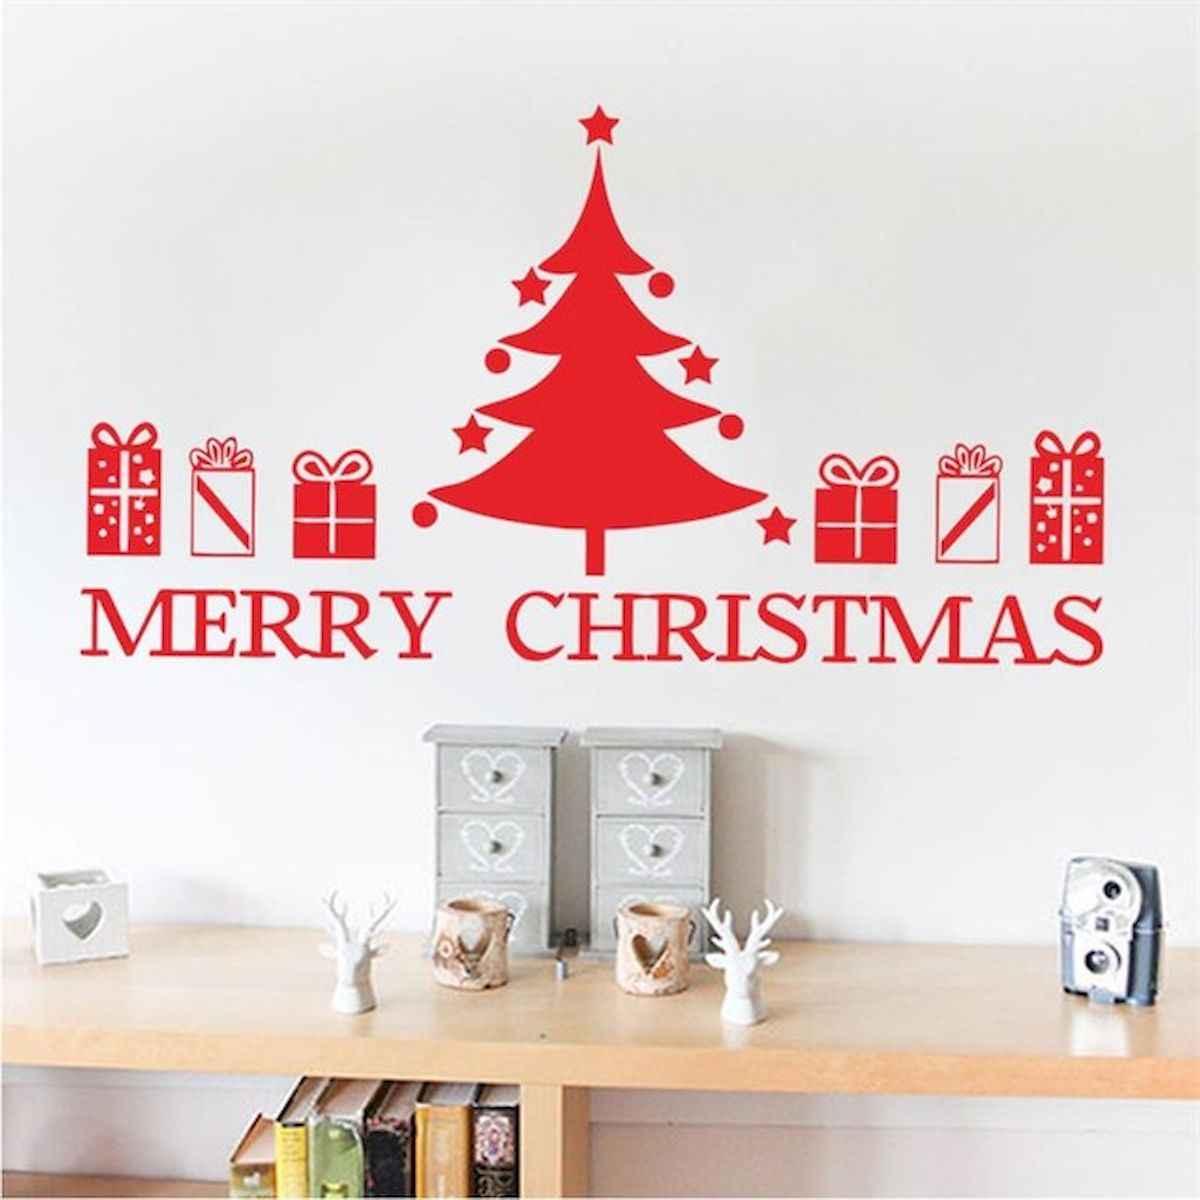 50 Creative DIY Christmas Decor Ideas And Design (9)